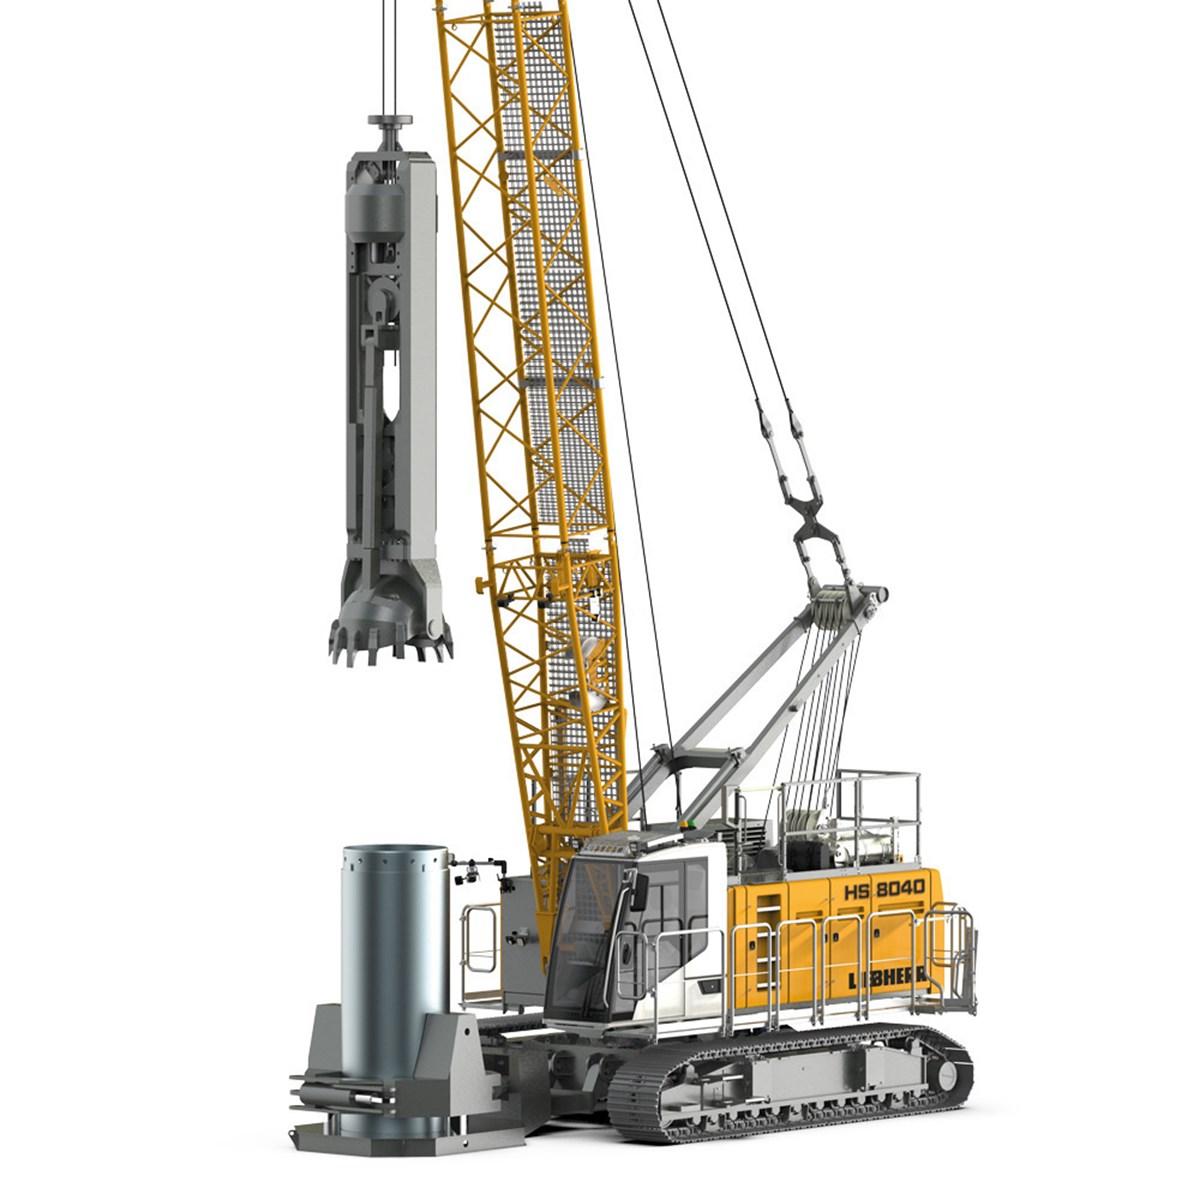 liebherr-hs-8040-1-duty-cycle-crawler-crane-seilbagger-casing-drilling.jpg